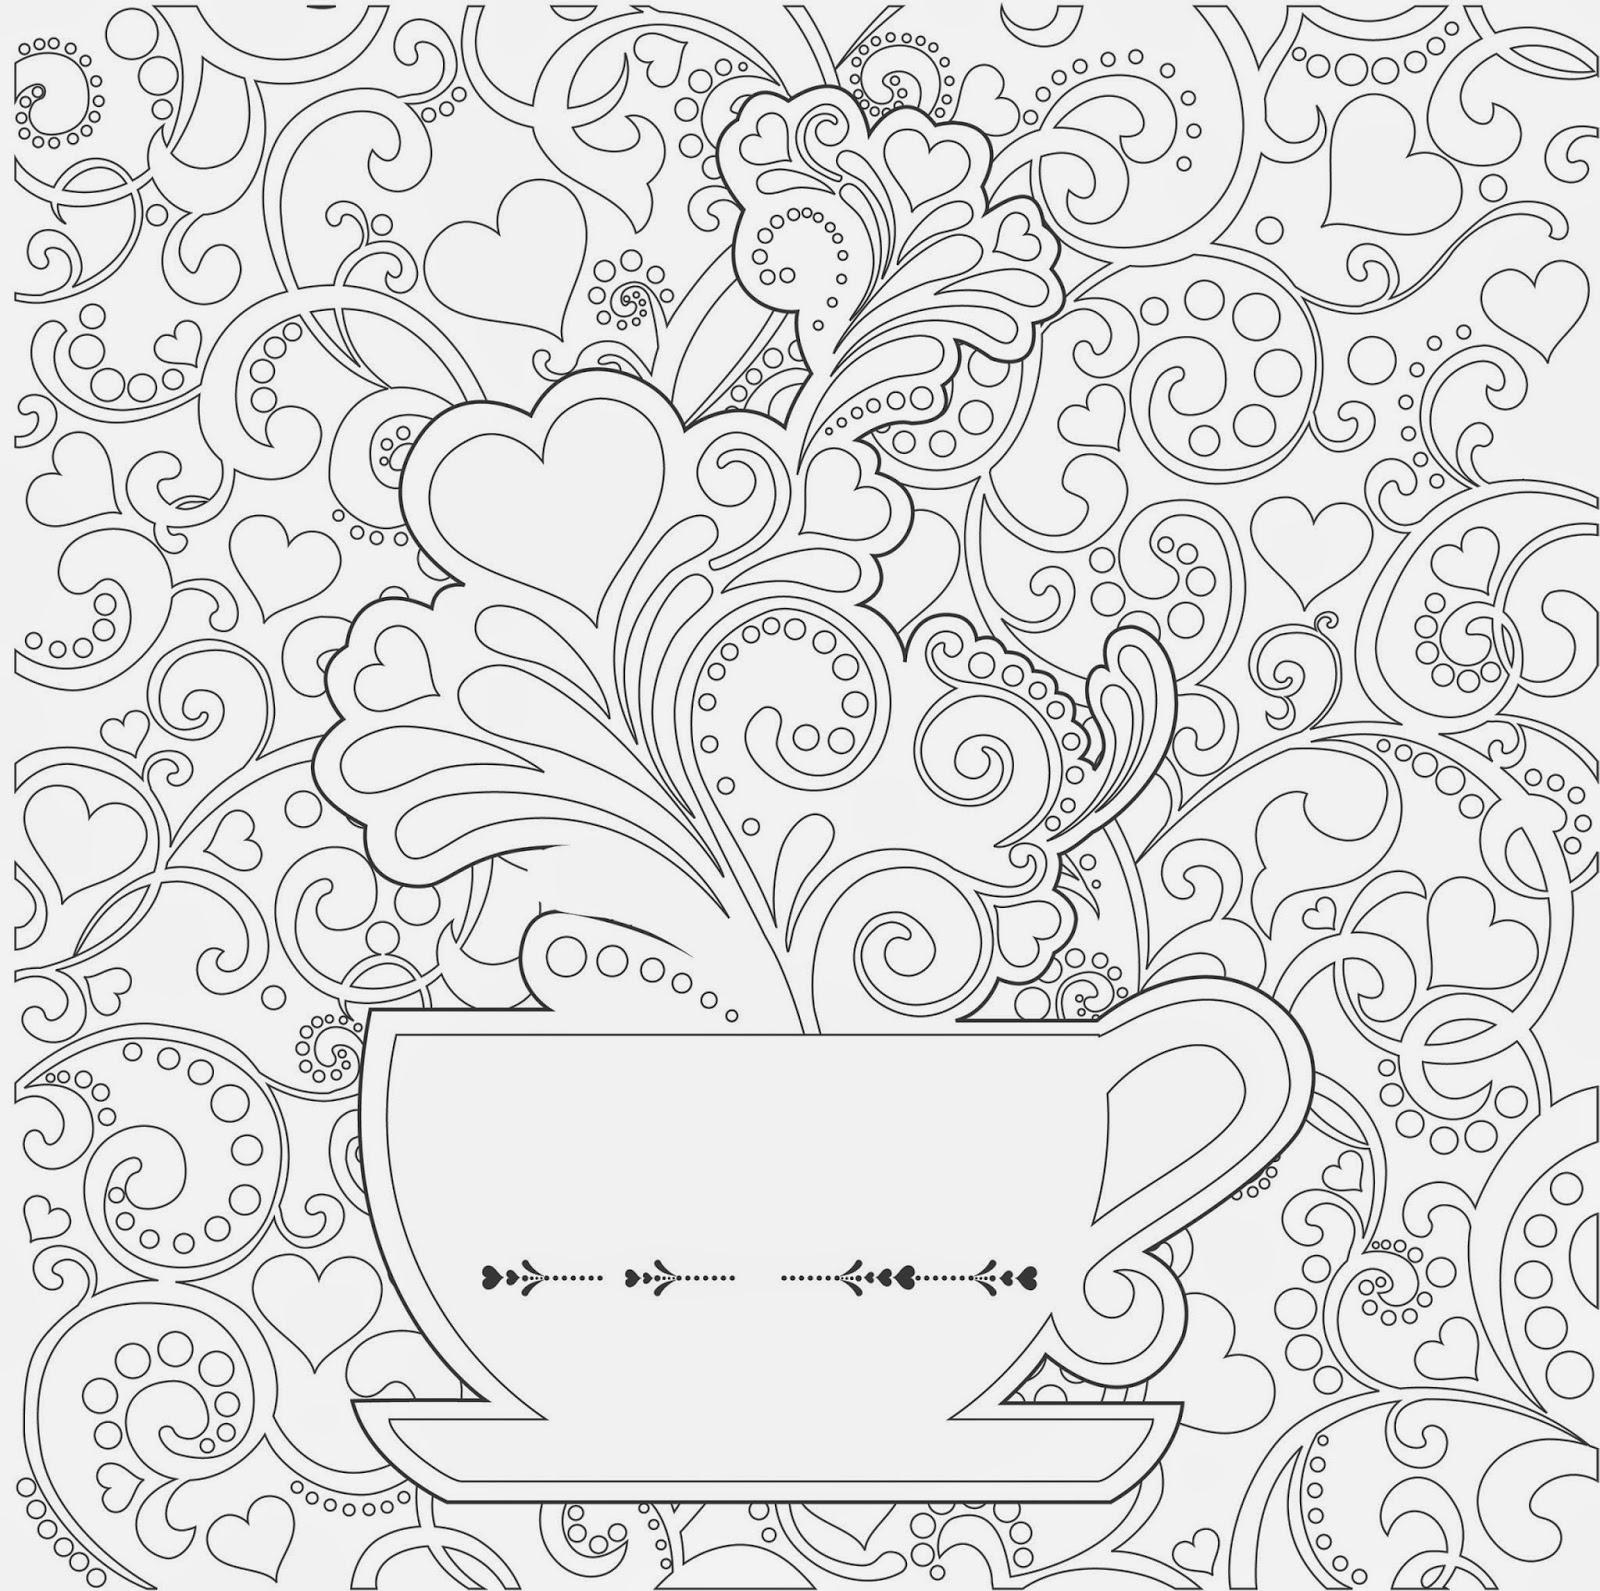 Kleurplaat Voor Volwassenen Printen Love Antystresowe Kolorowanki Z Tobą Mi Lżej